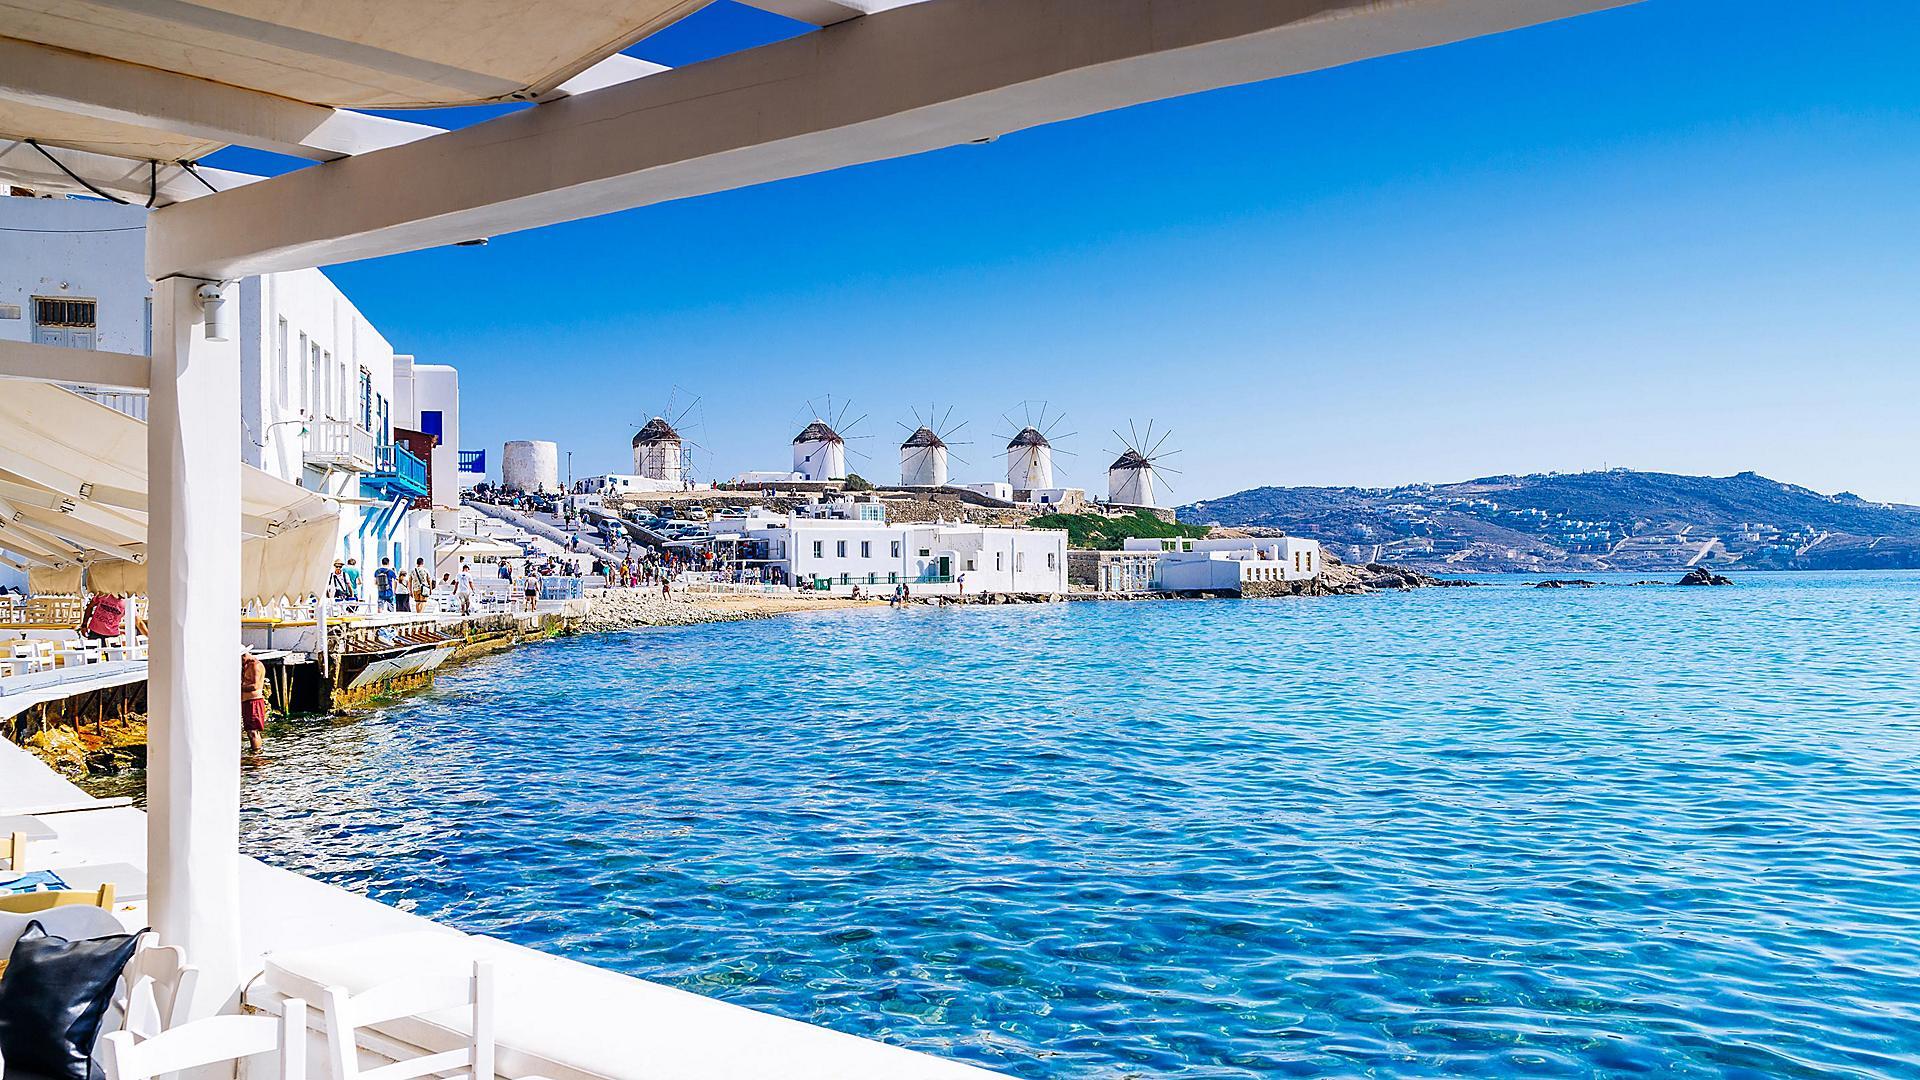 7 Night Greek Isles Cruise From Rome Civitavecchia Italy Royal